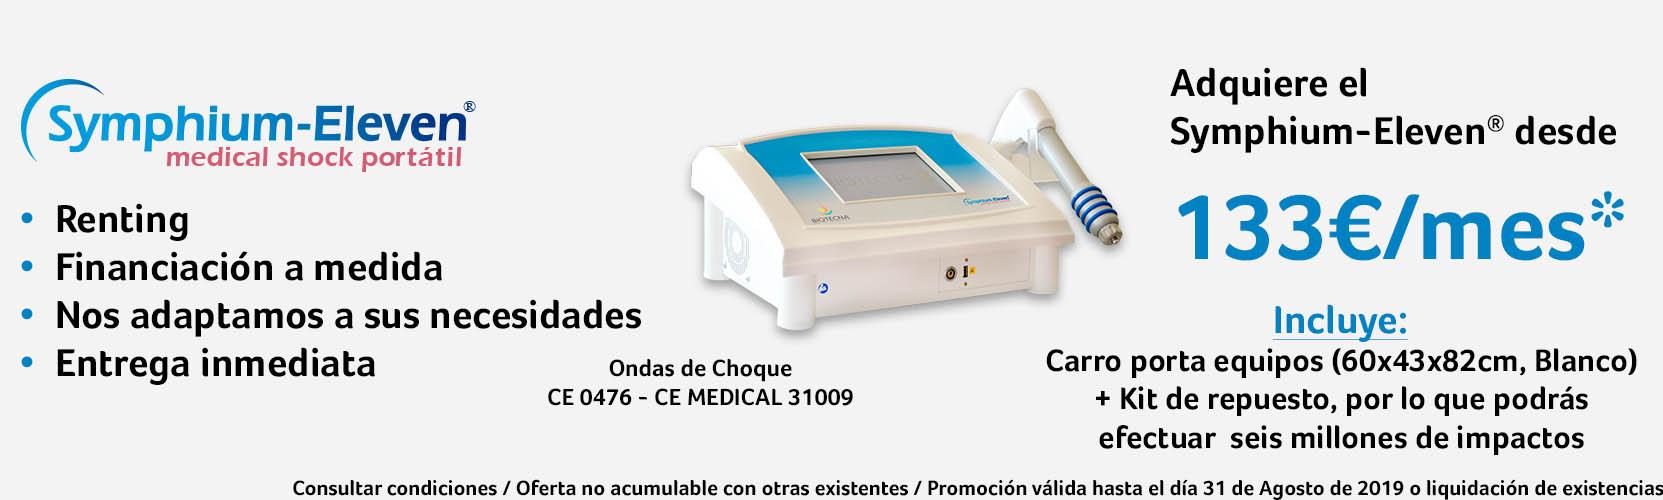 Biotecna-Ofertas-Agosto-2019-Symphium-Eleven